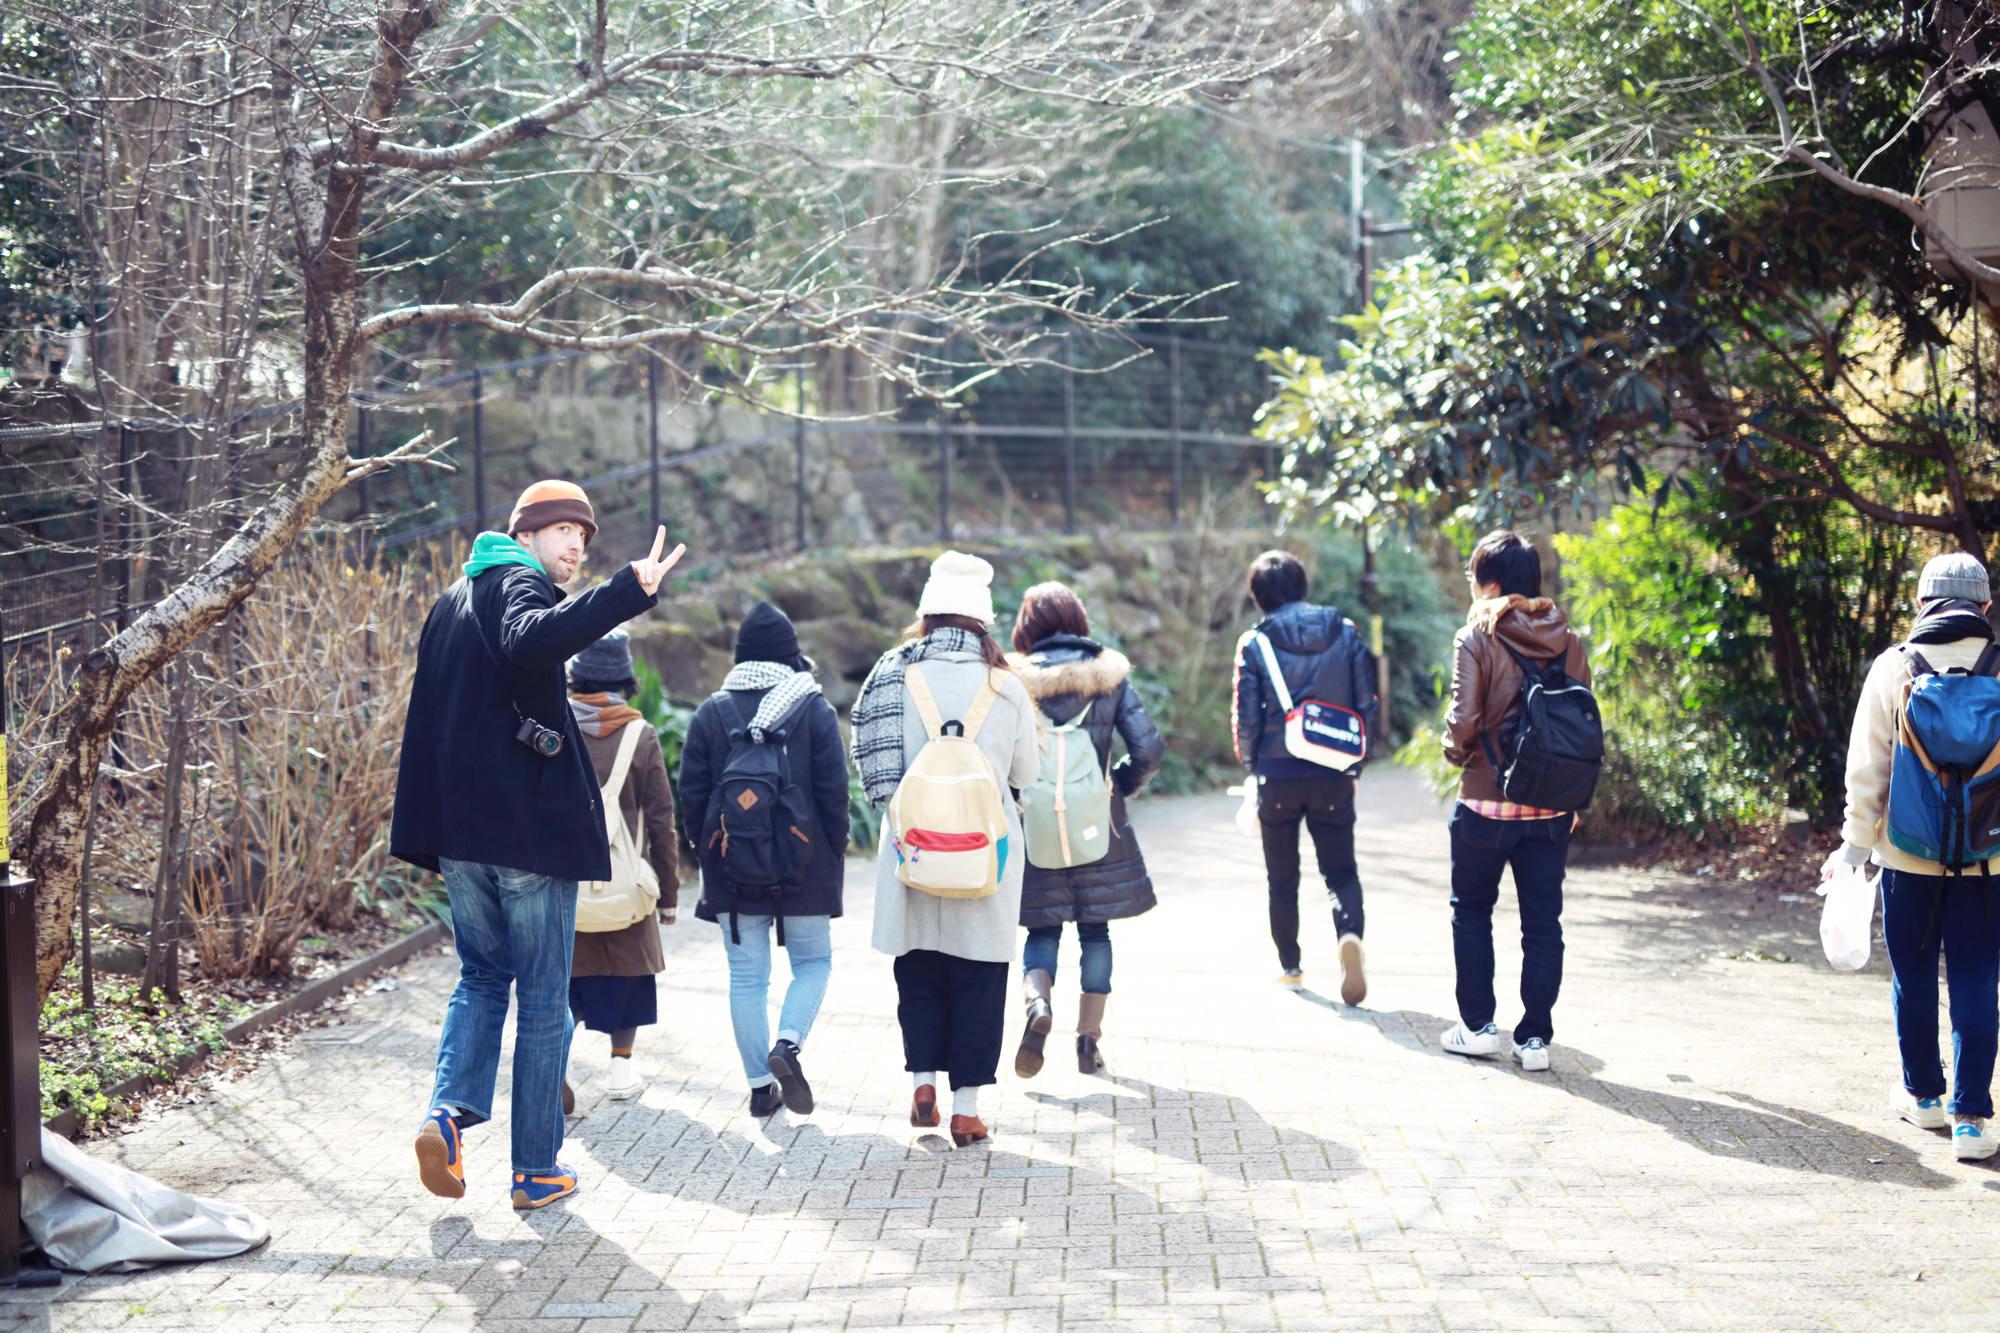 PIC#05 東京写真部「バスの旅:東98系統(東京駅〜等々力)」